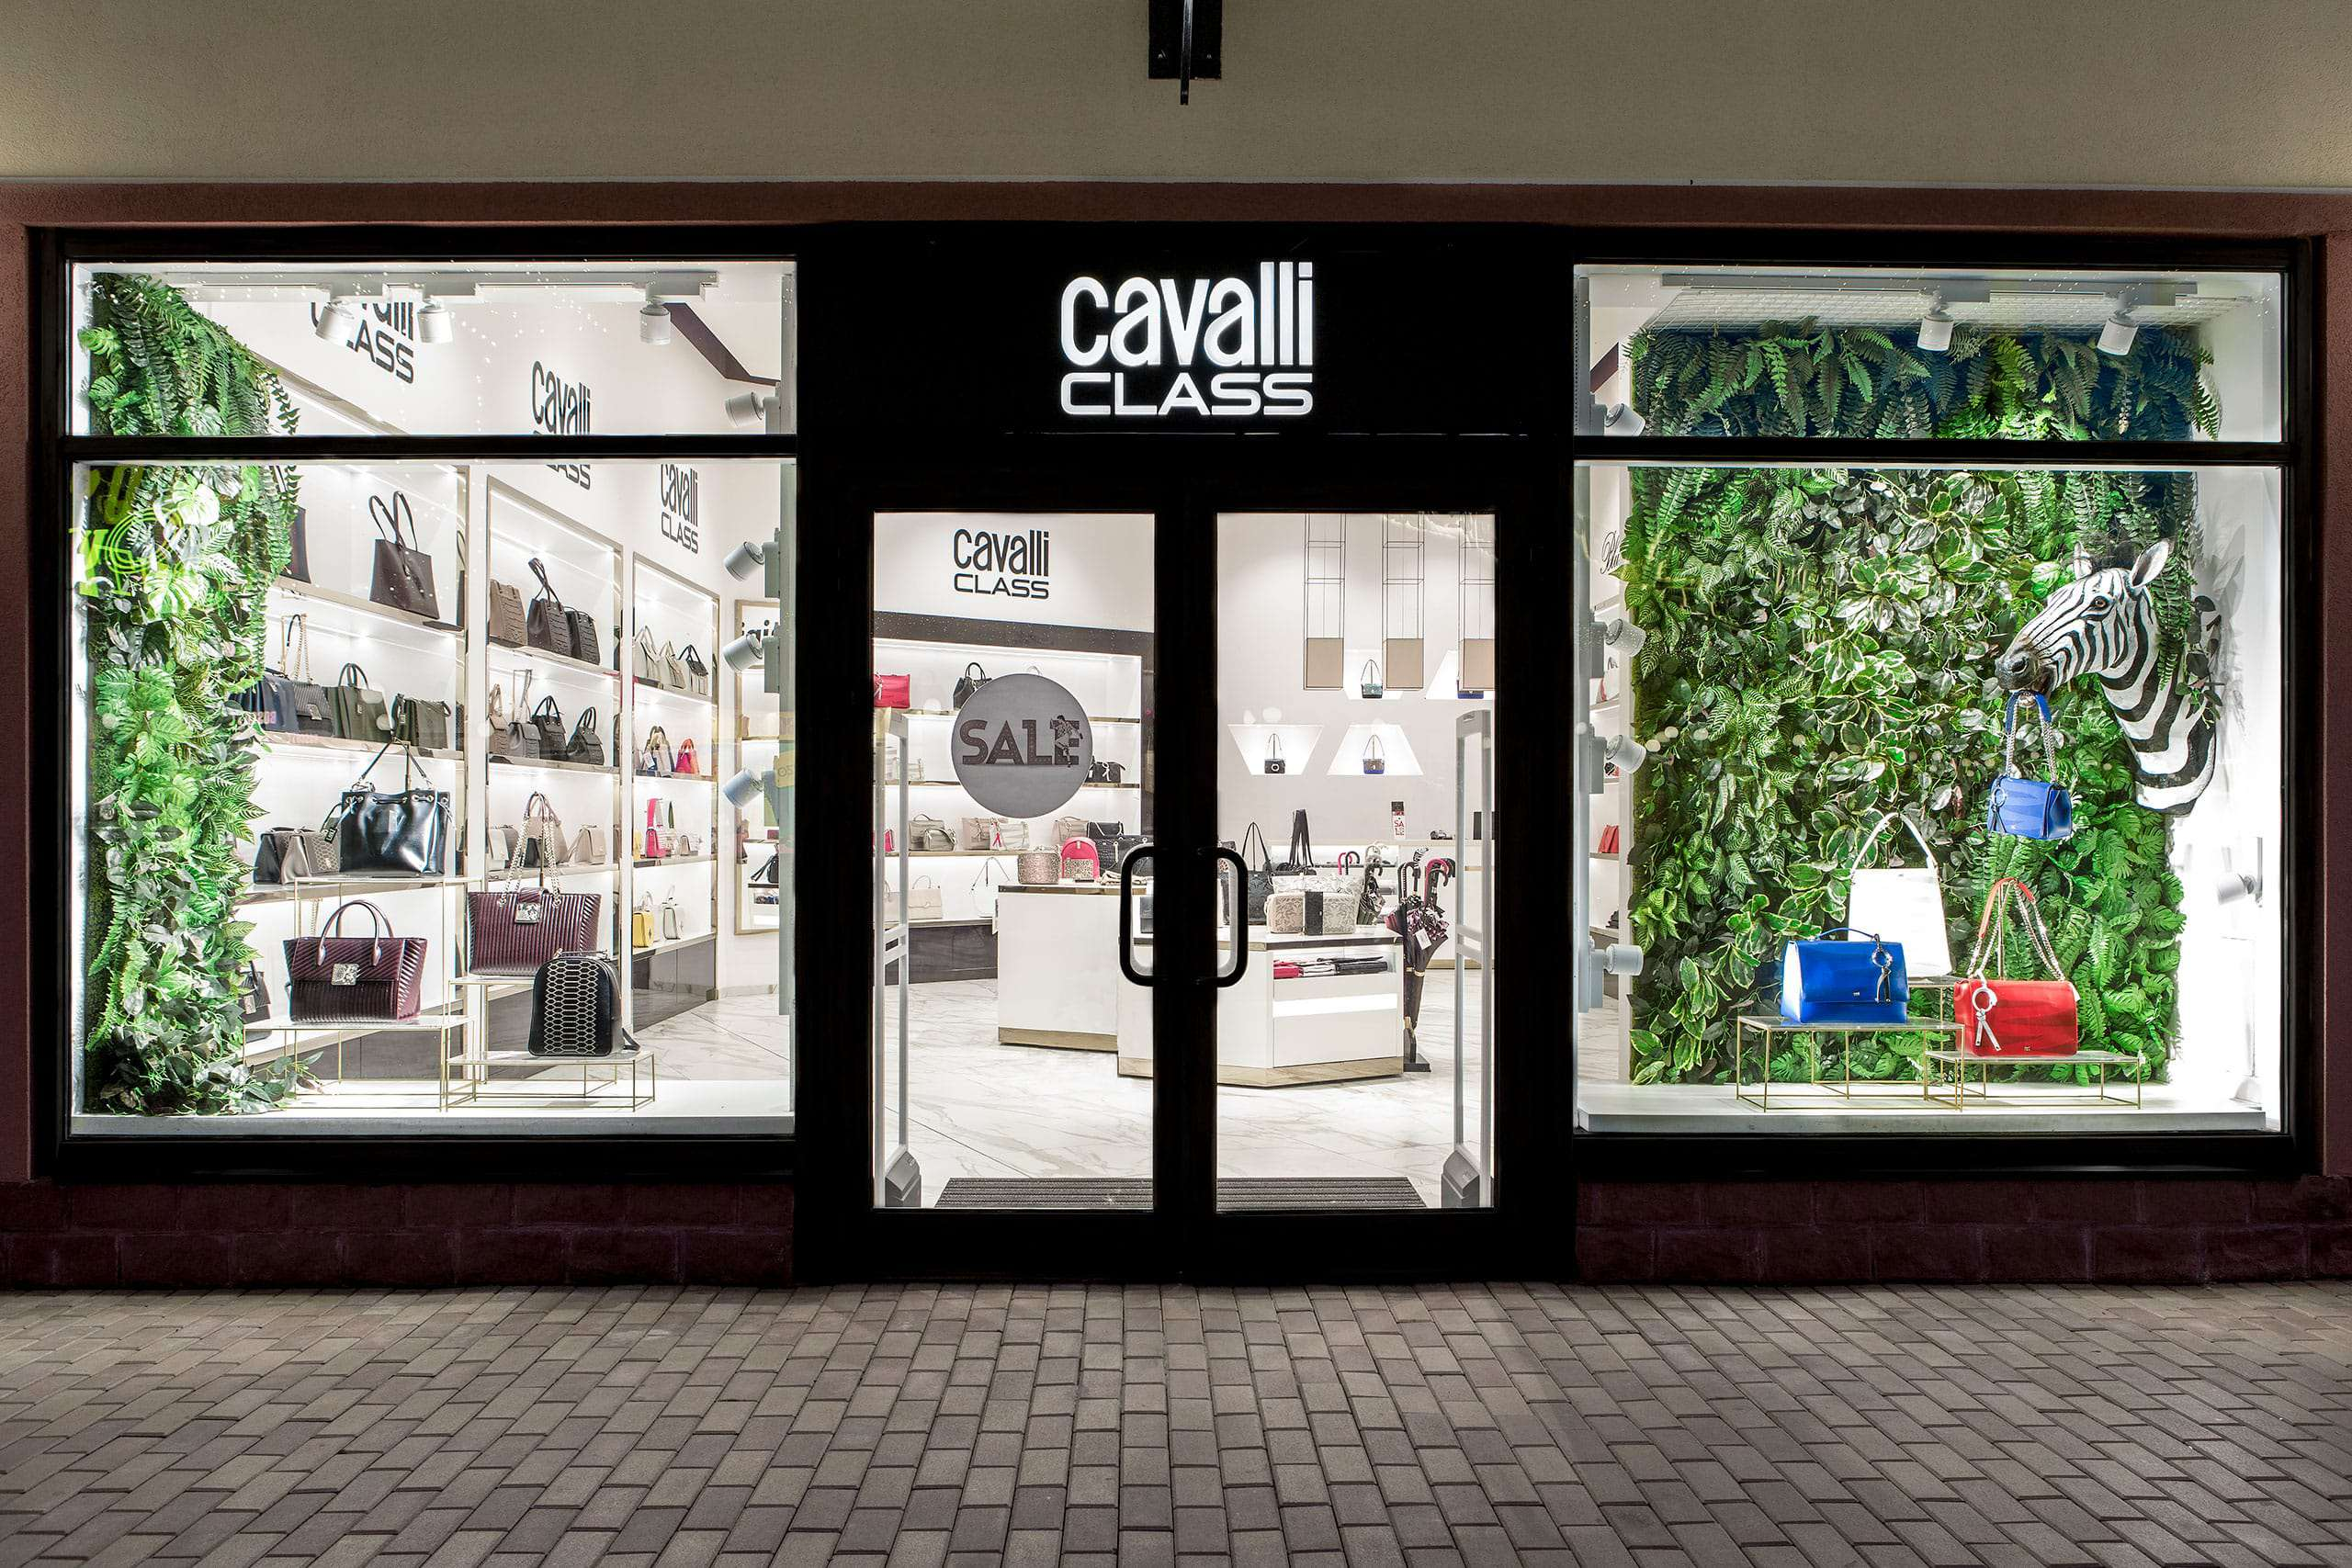 Cavalli_Class_Shop_01